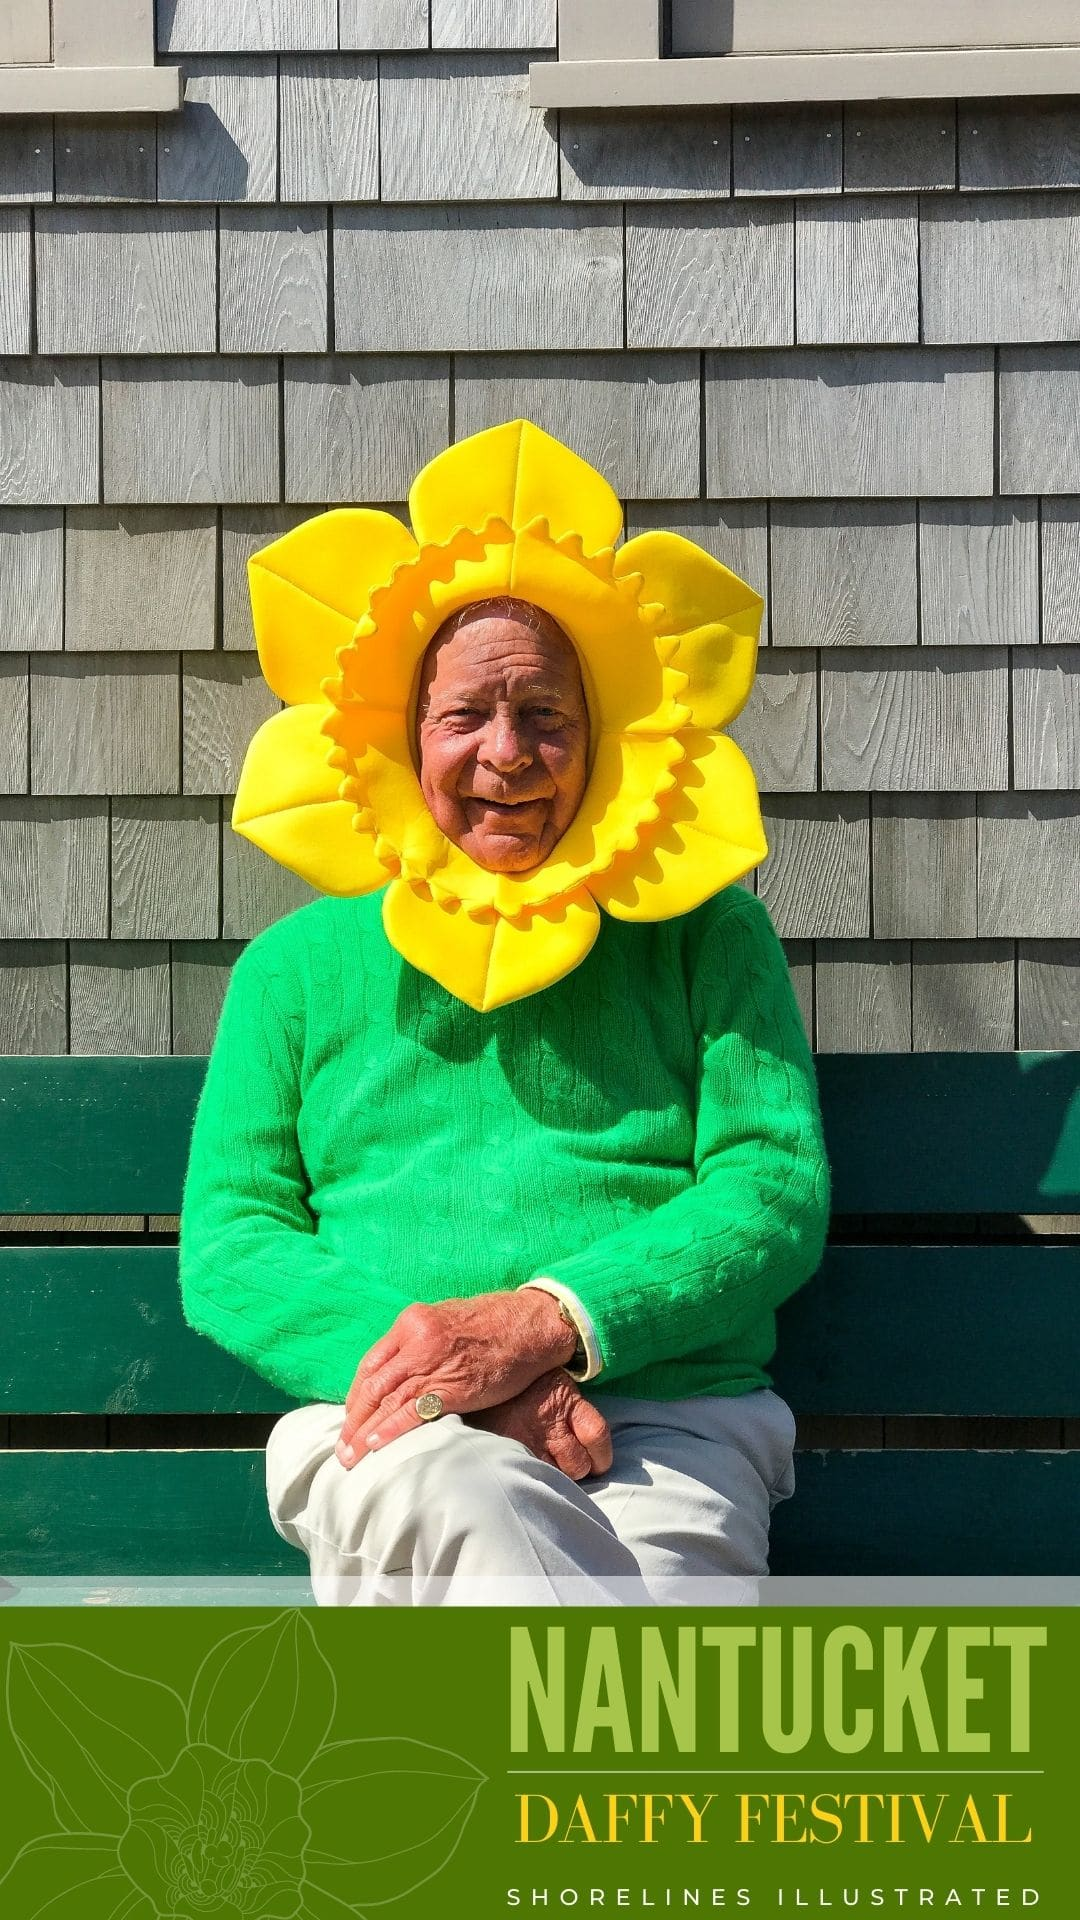 Nantucket Daffy Festival